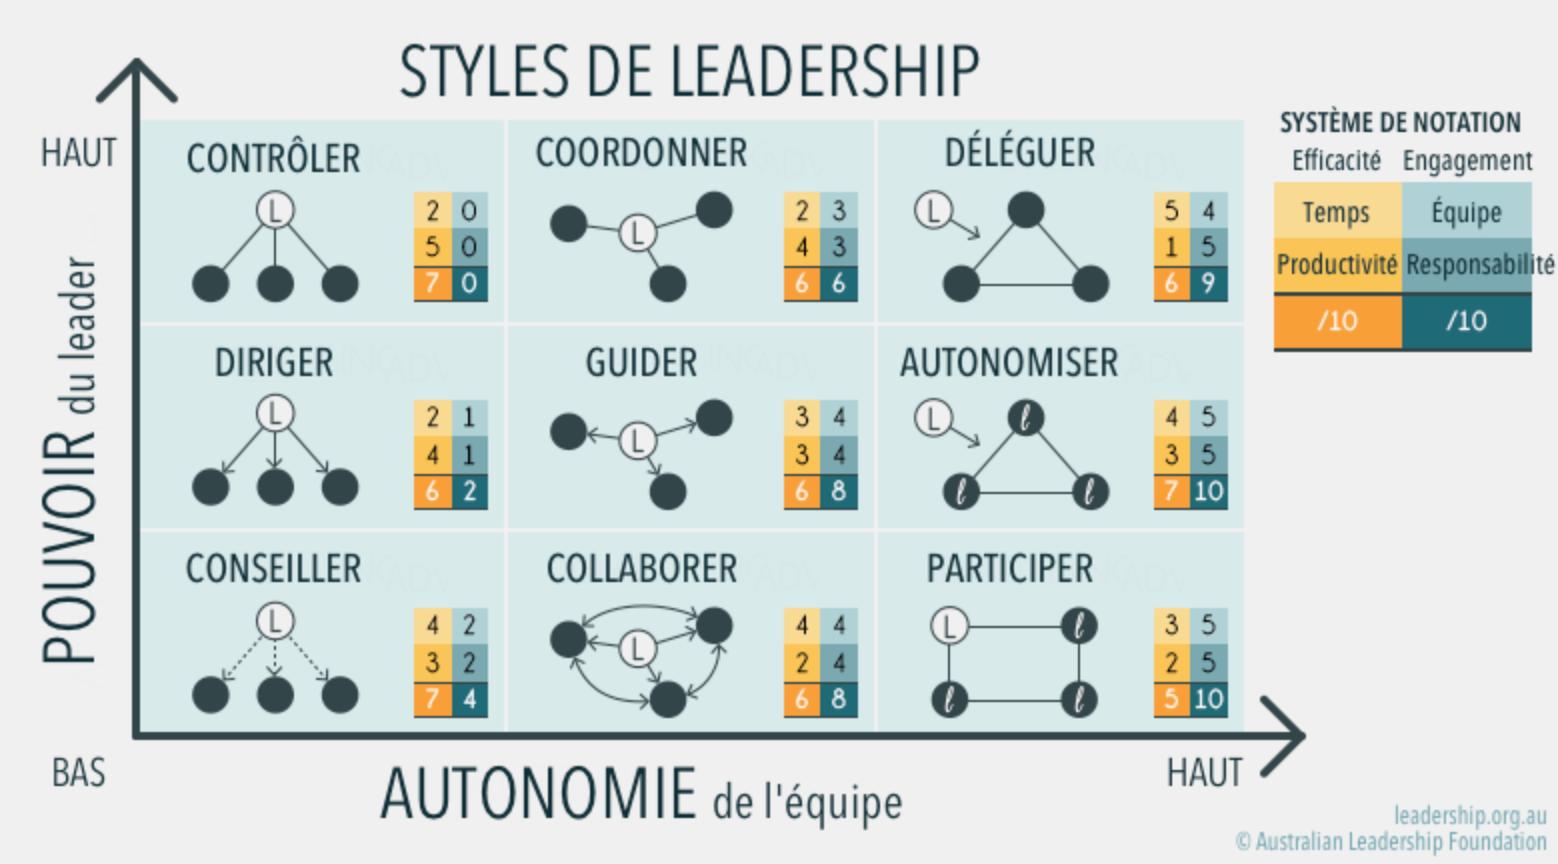 Les styles de leadership